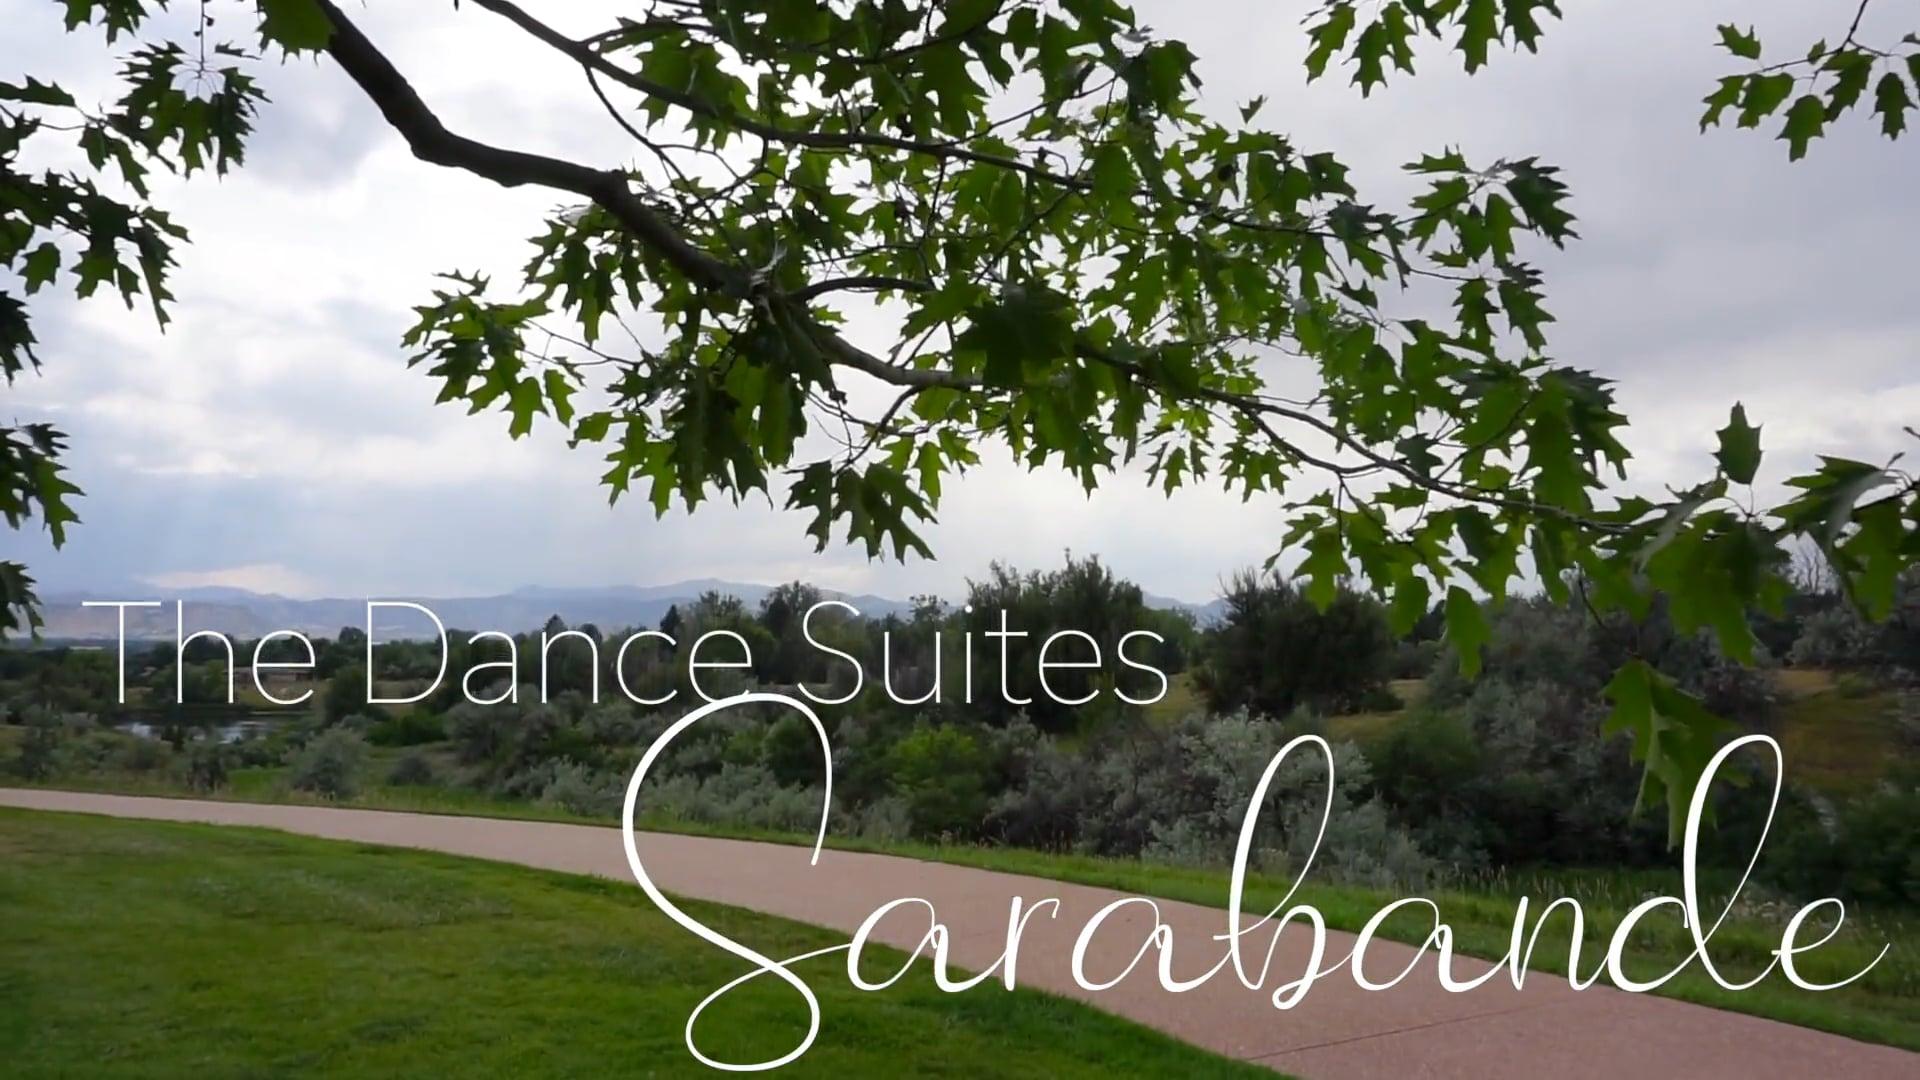 The Dance Suites: Sarabande